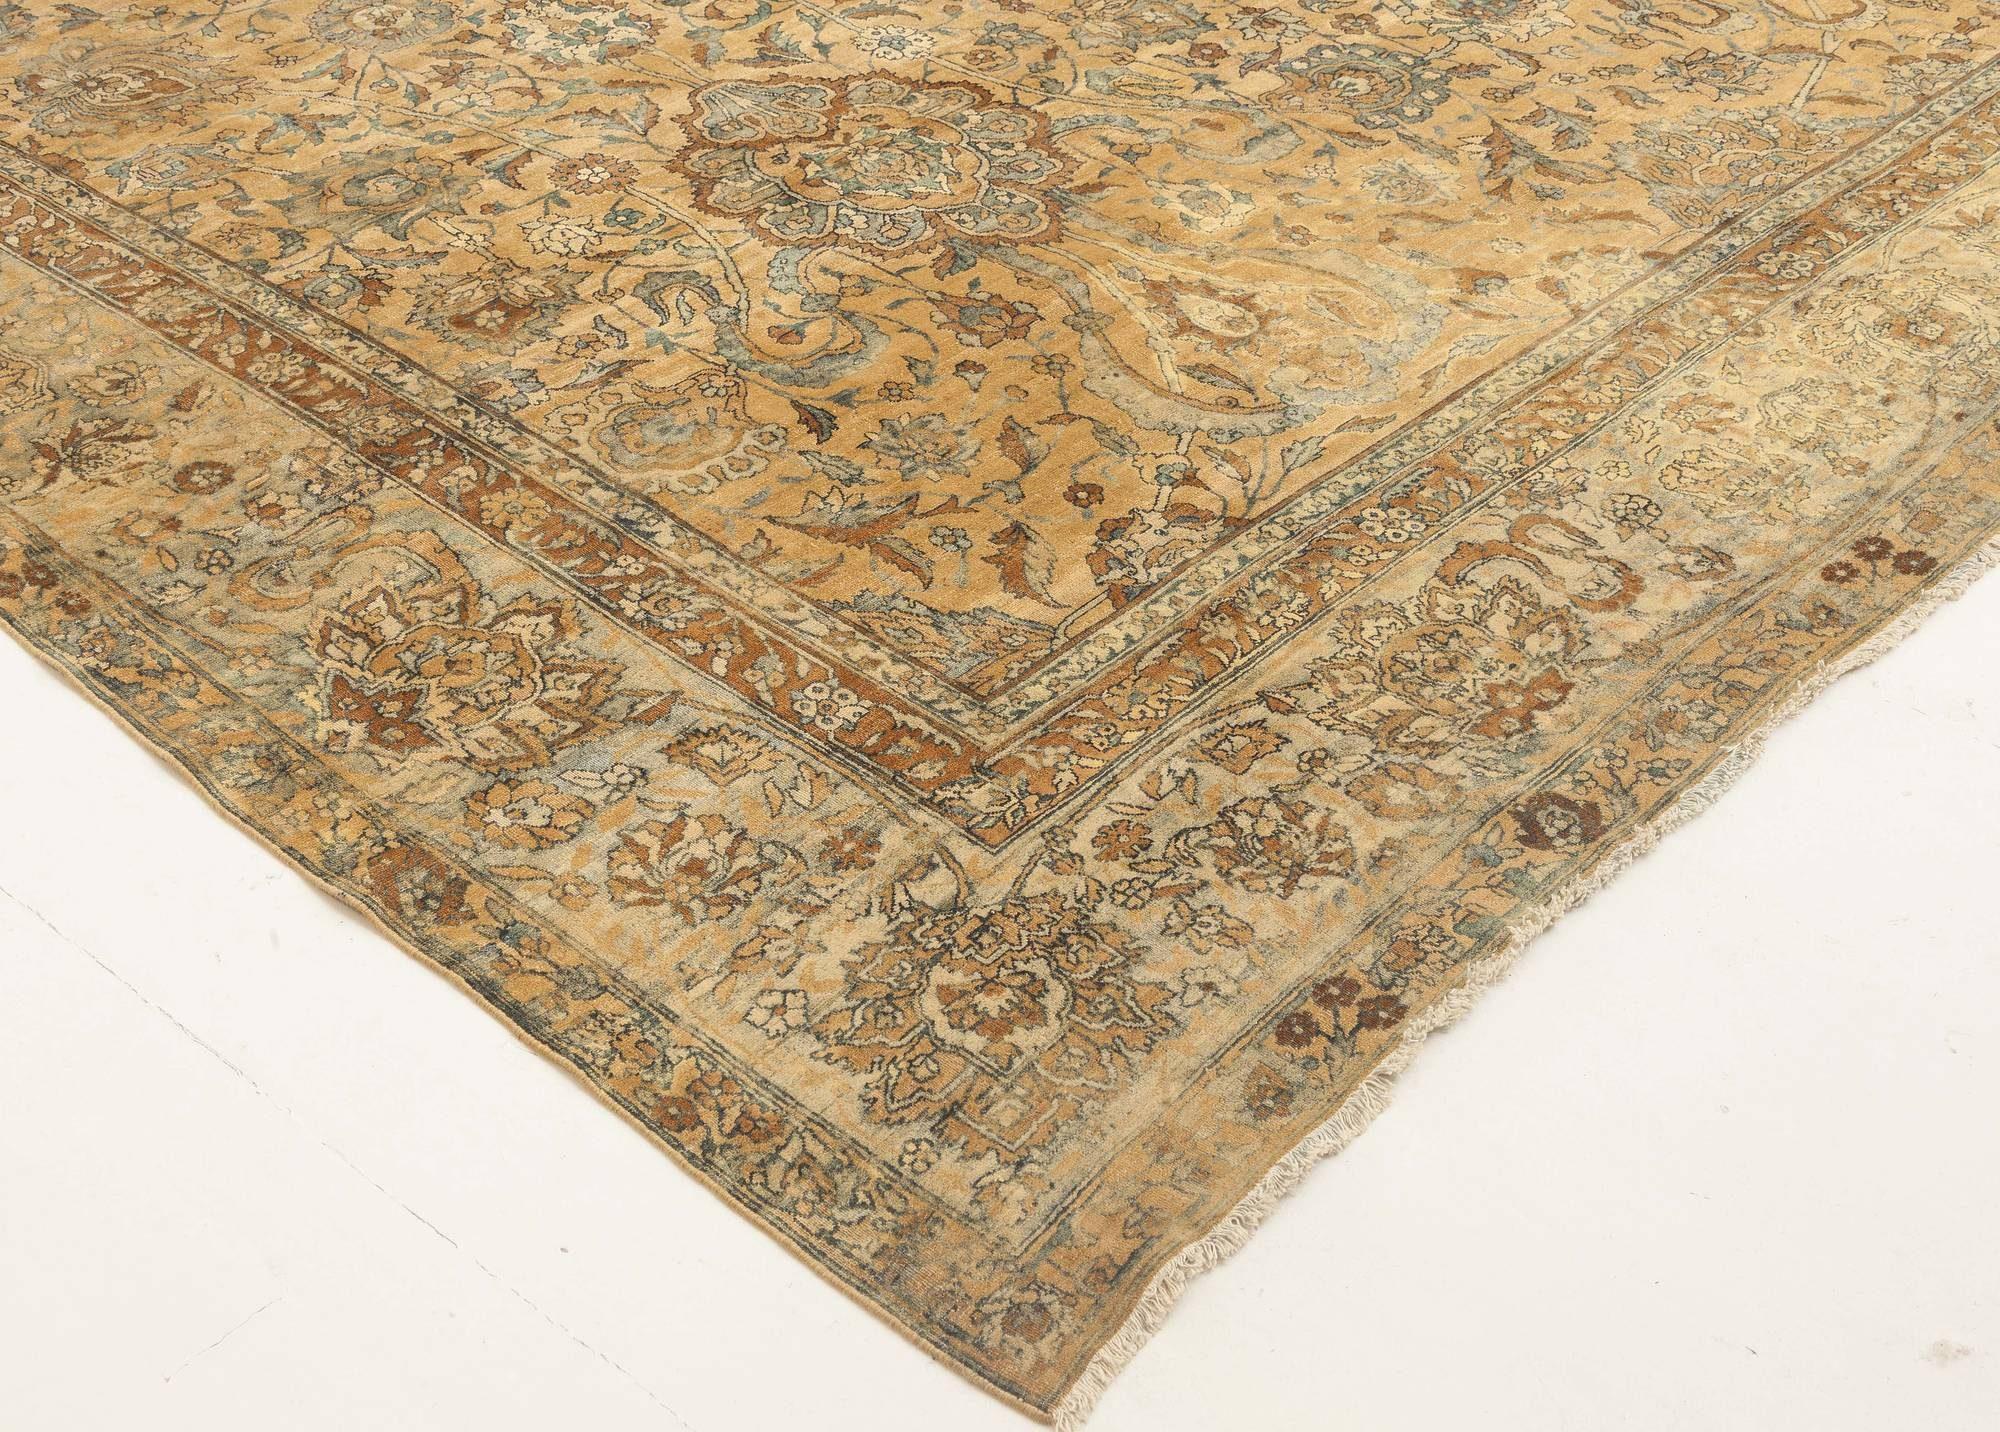 Antique Persian Kirman Carpet BB2841